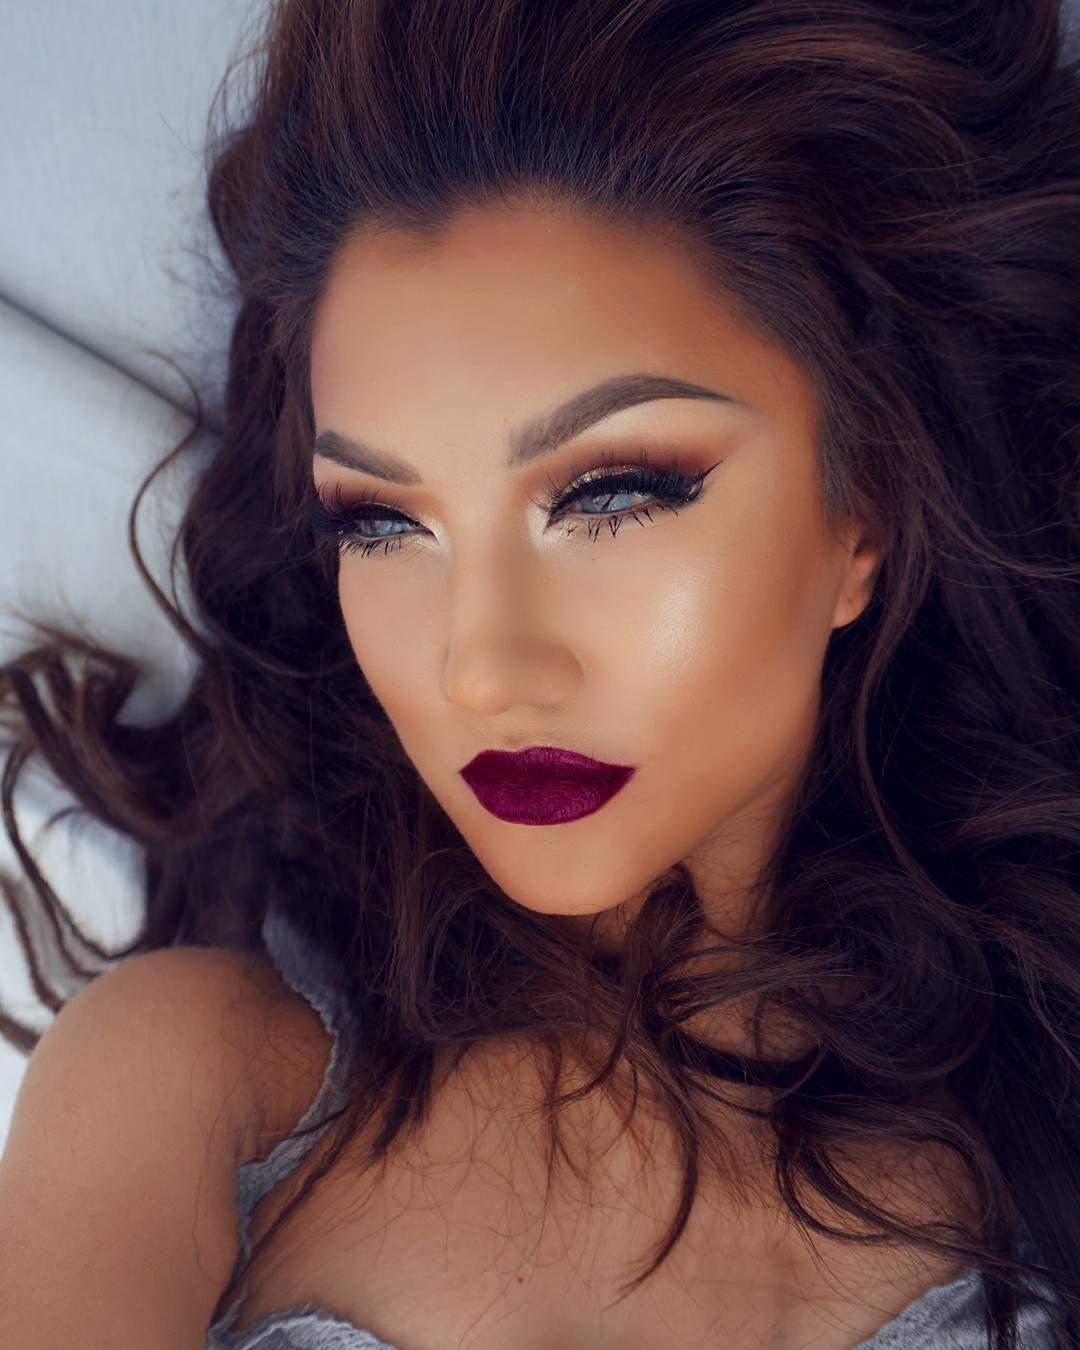 Pinterest esinoztas flawless makeup pinterest follow me